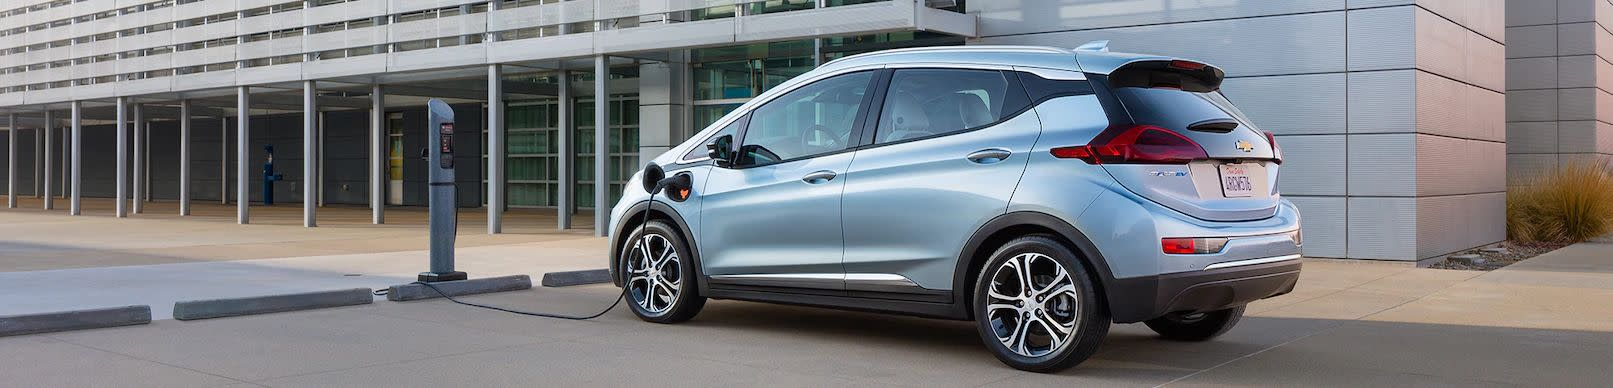 Chevrolet Bolt EV 2018 a la venta cerca de San Diego, CA